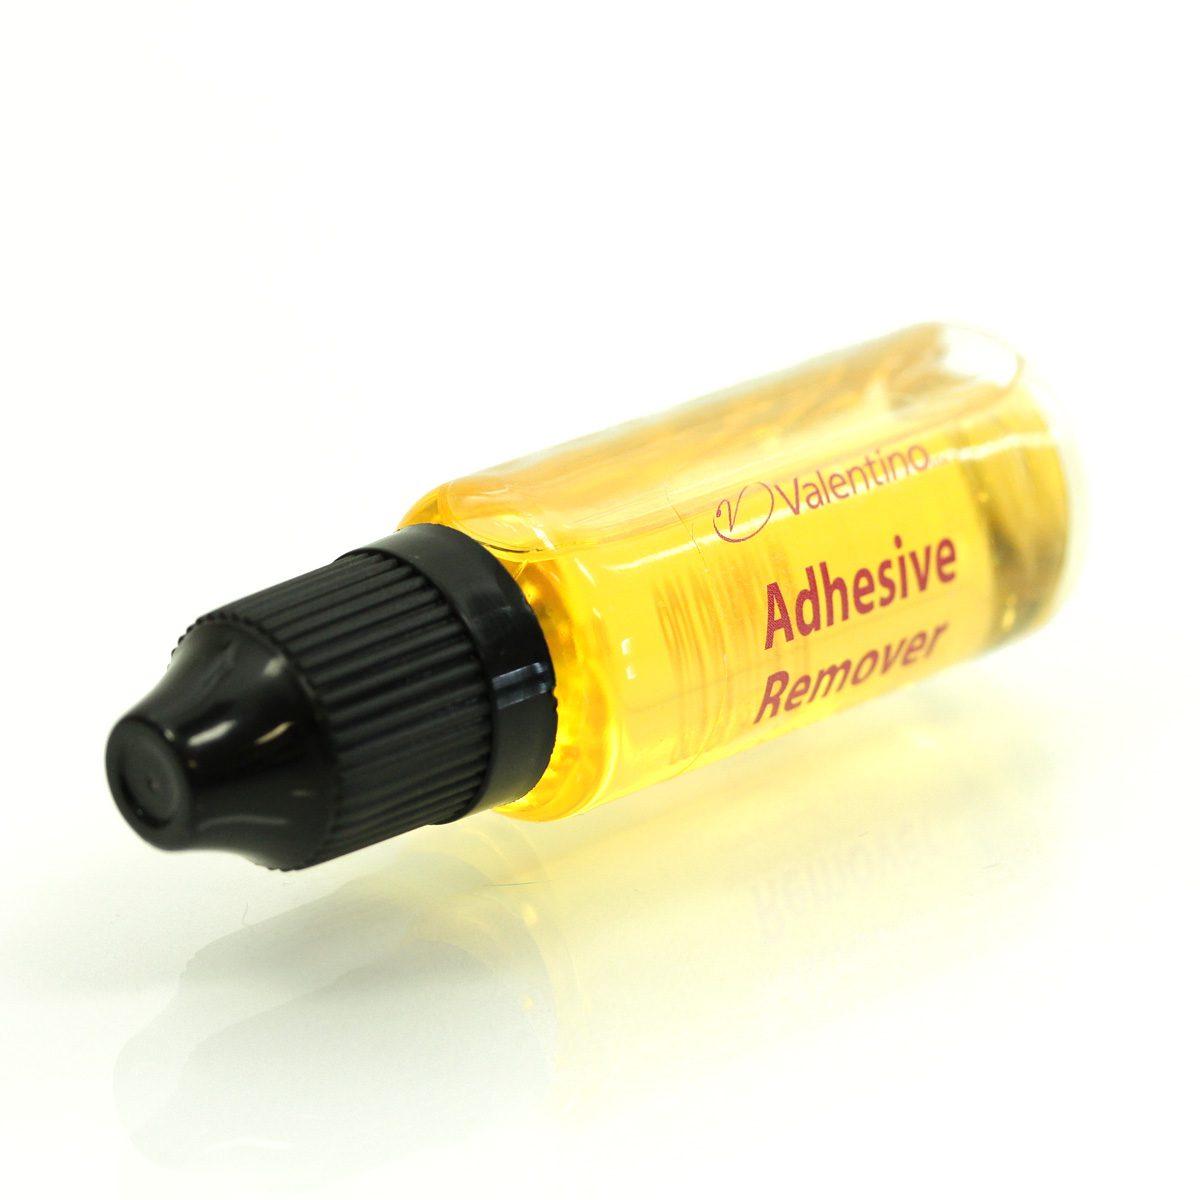 valentino adhesive remover 2